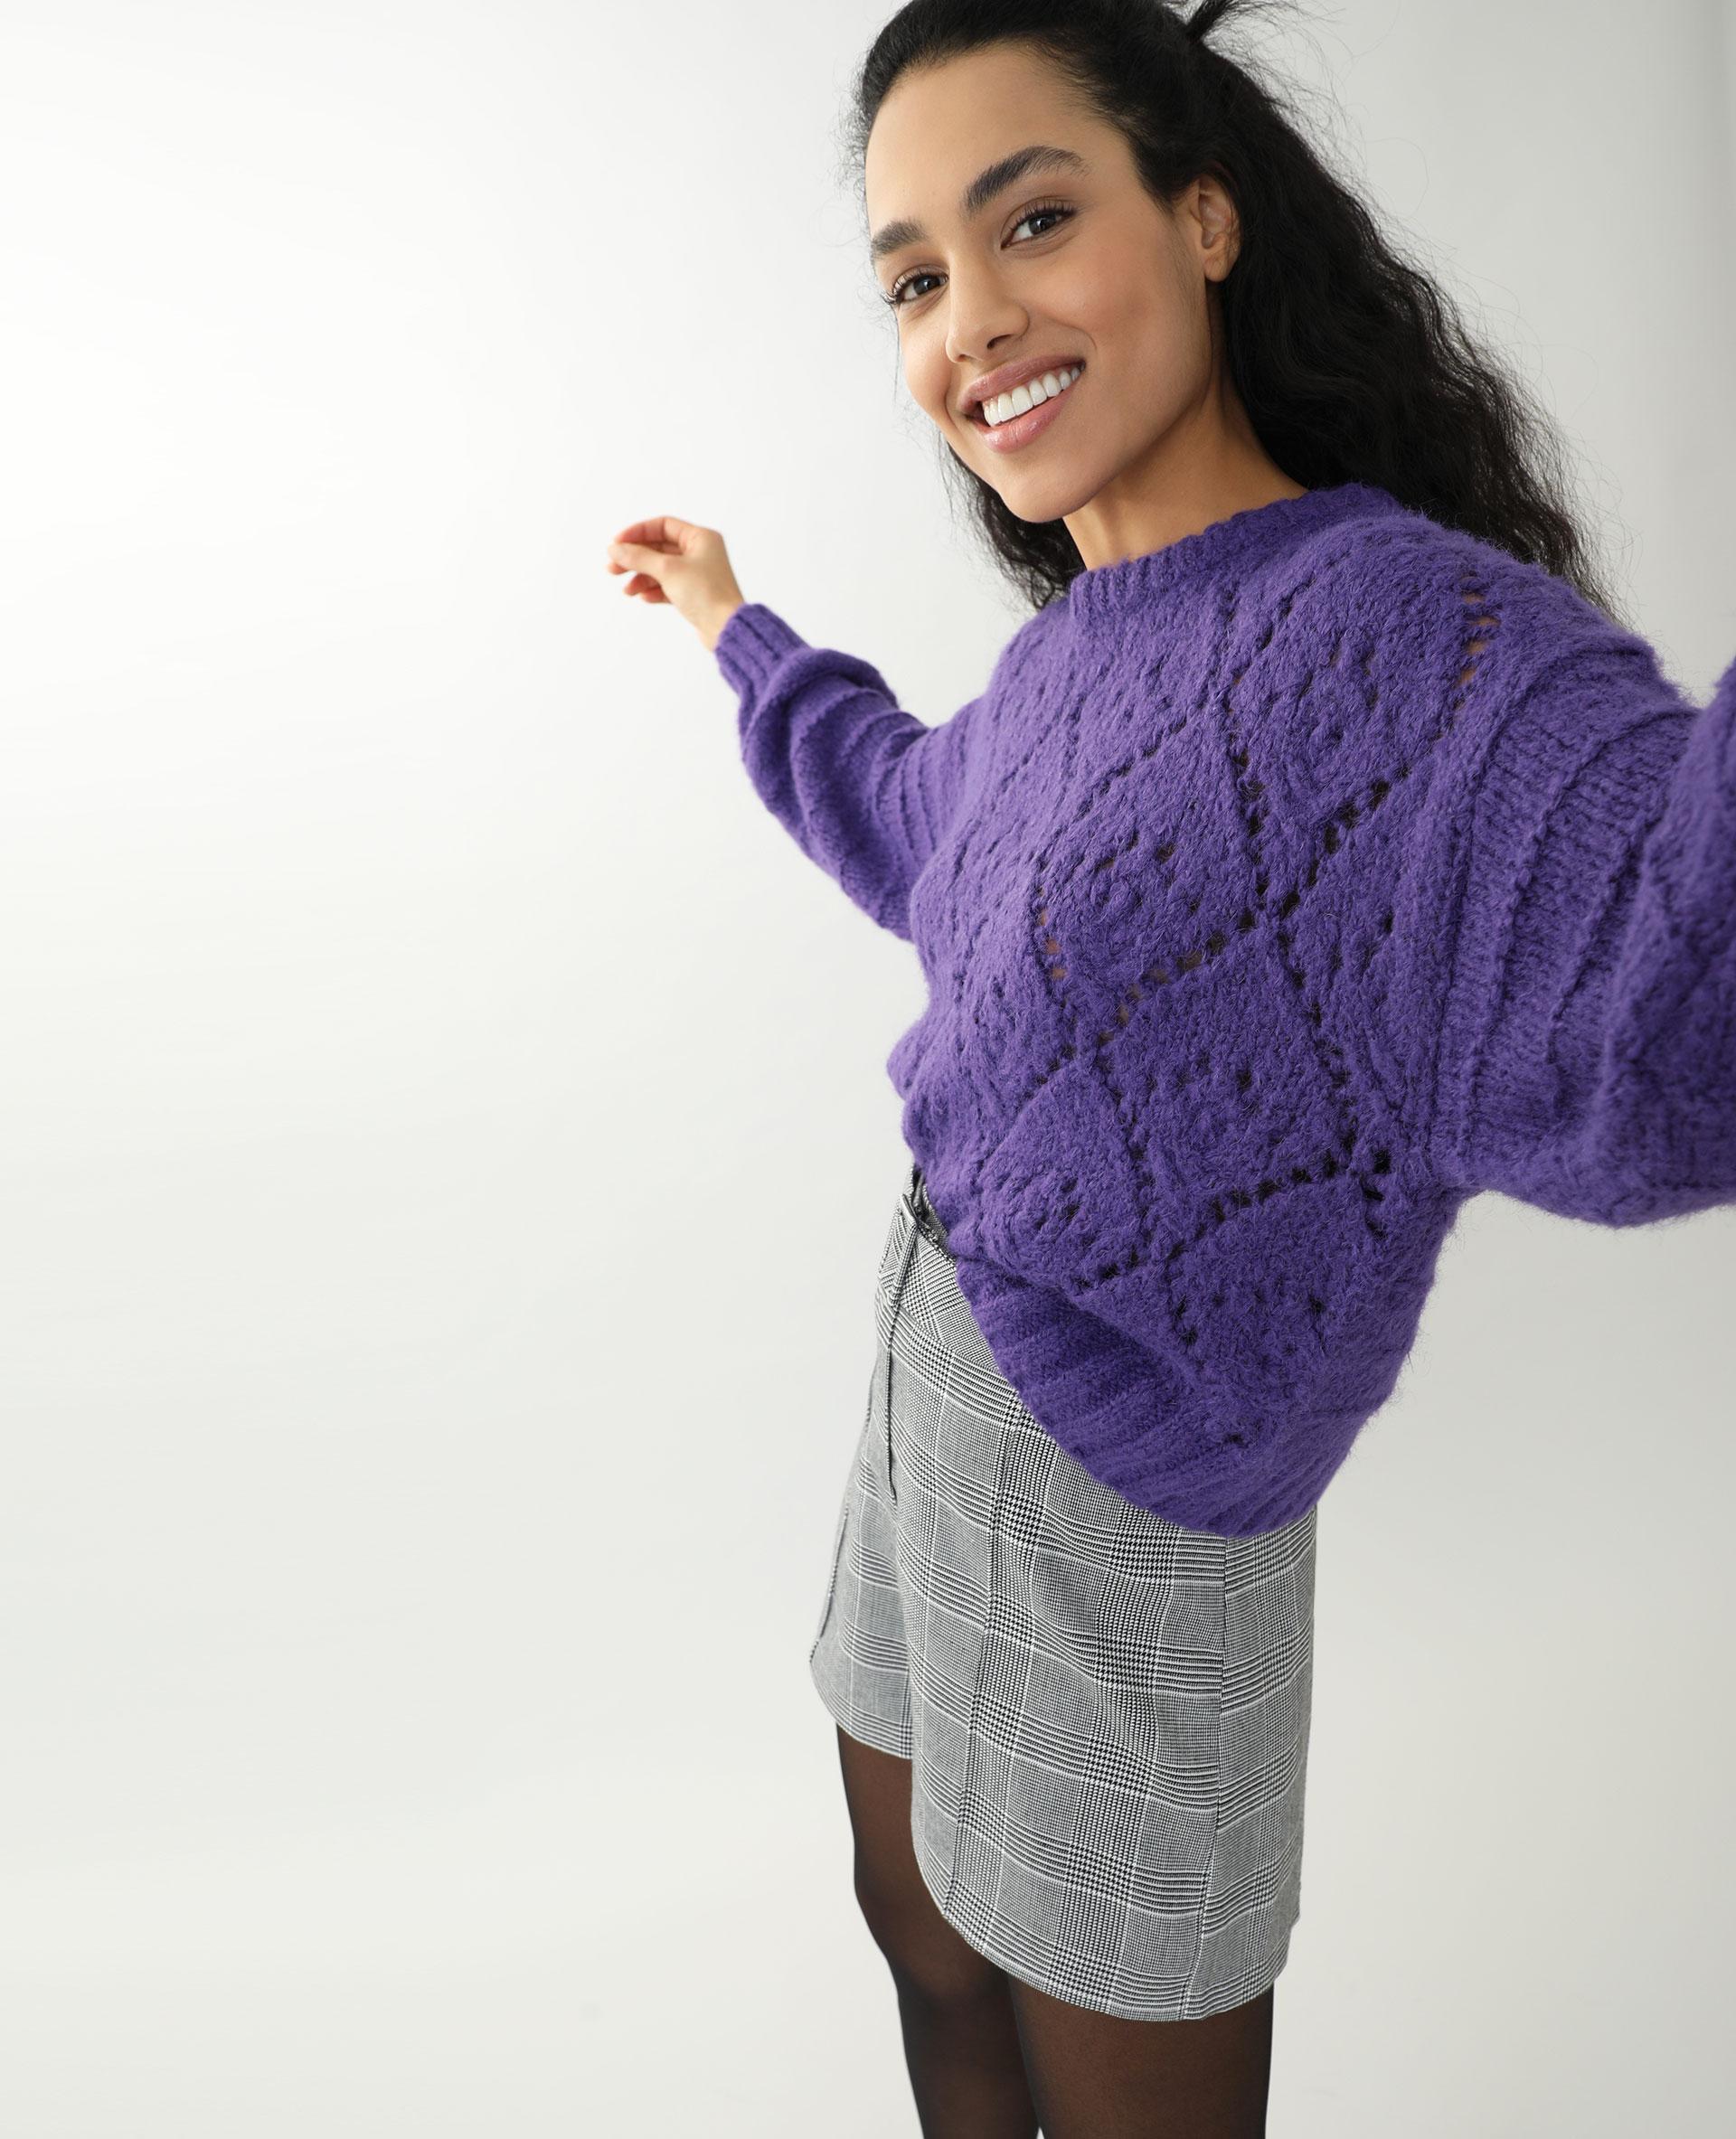 Pull ajouré violet - Pimkie